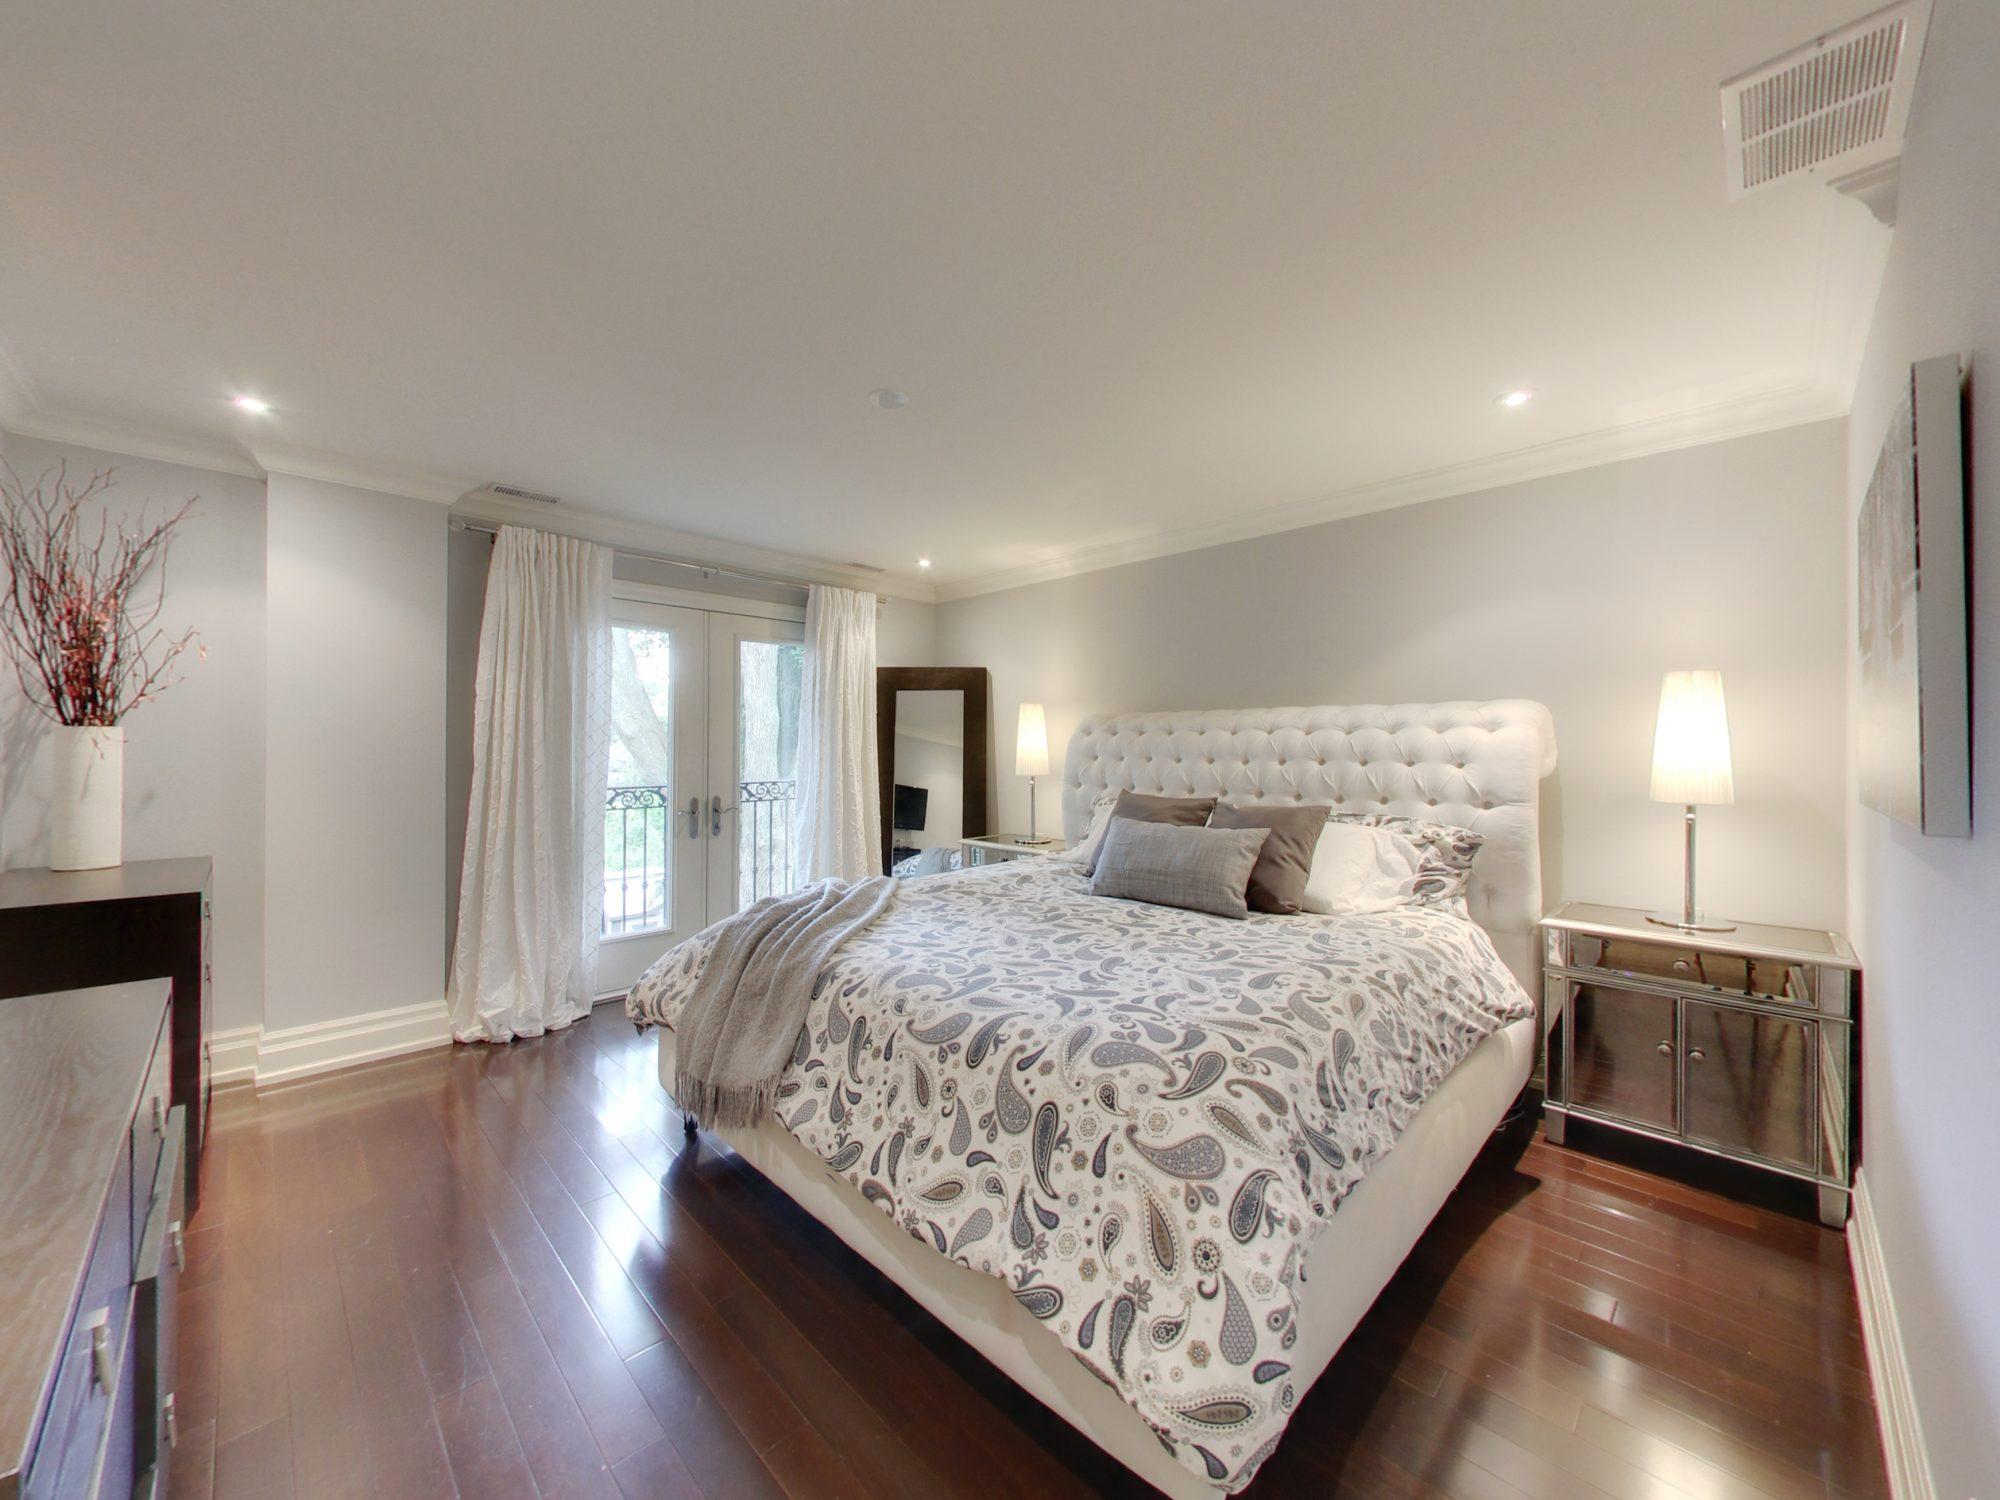 toronto-house-for-sale-15-shand-avenue-10